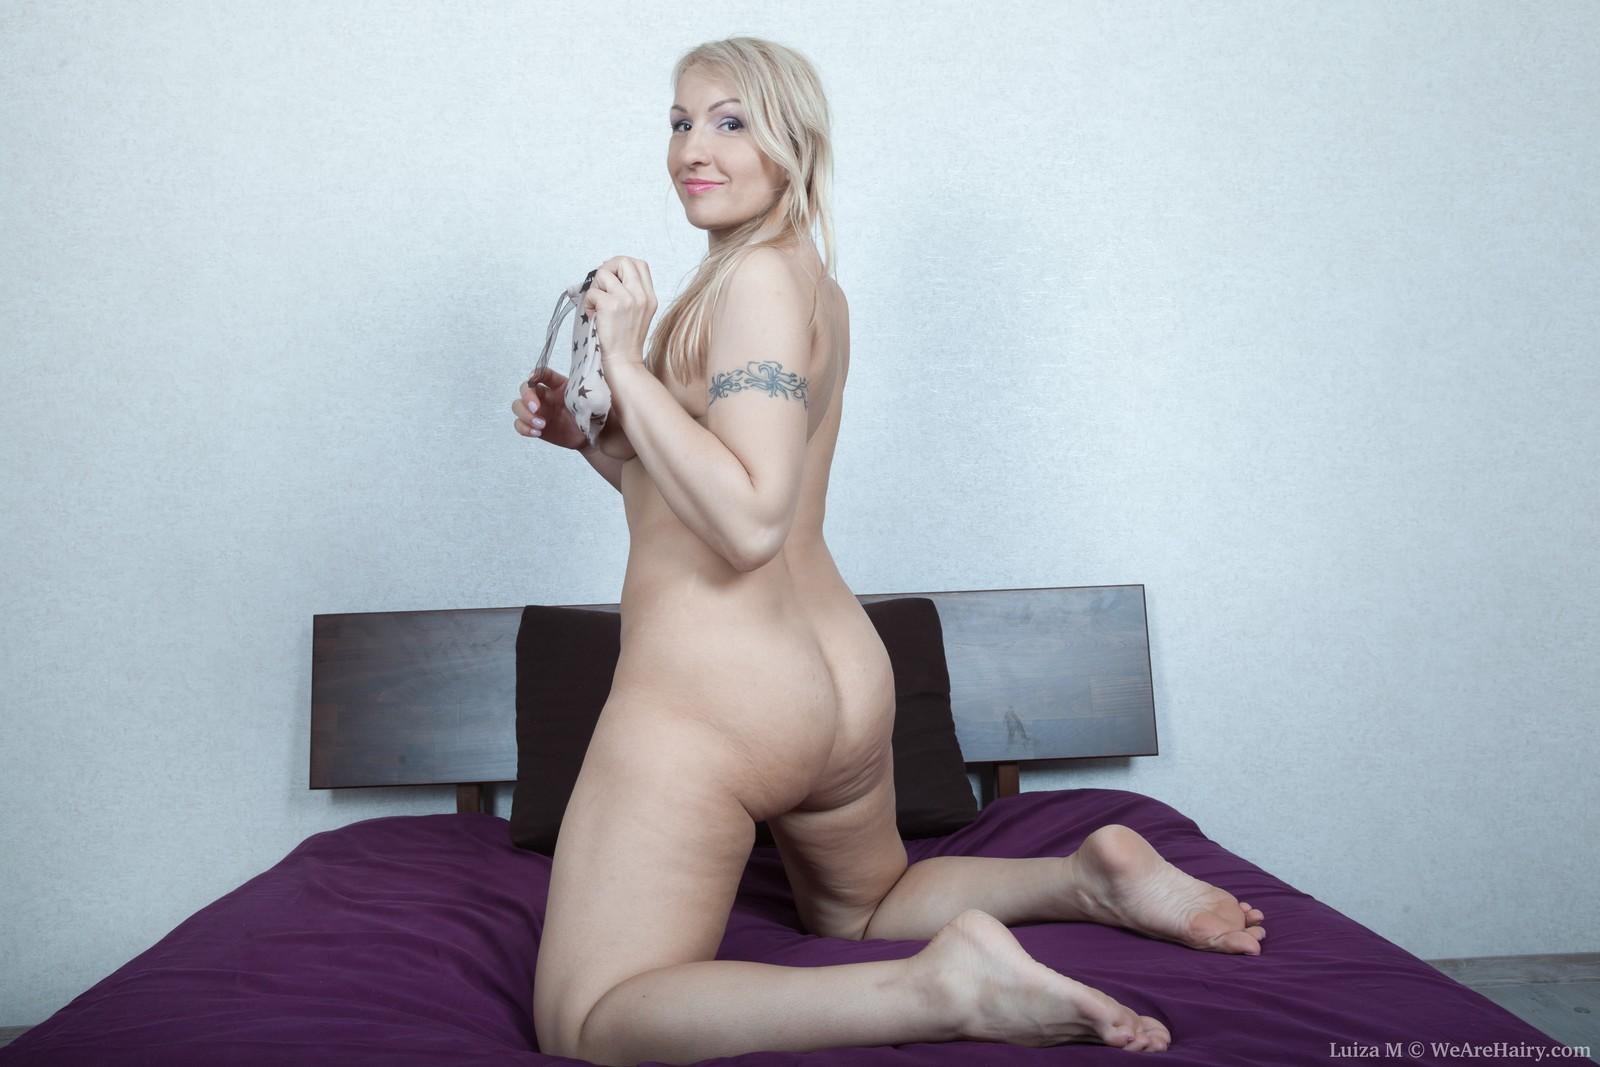 wpid-luiza-m-masturbates-with-her-vibrator12.jpg